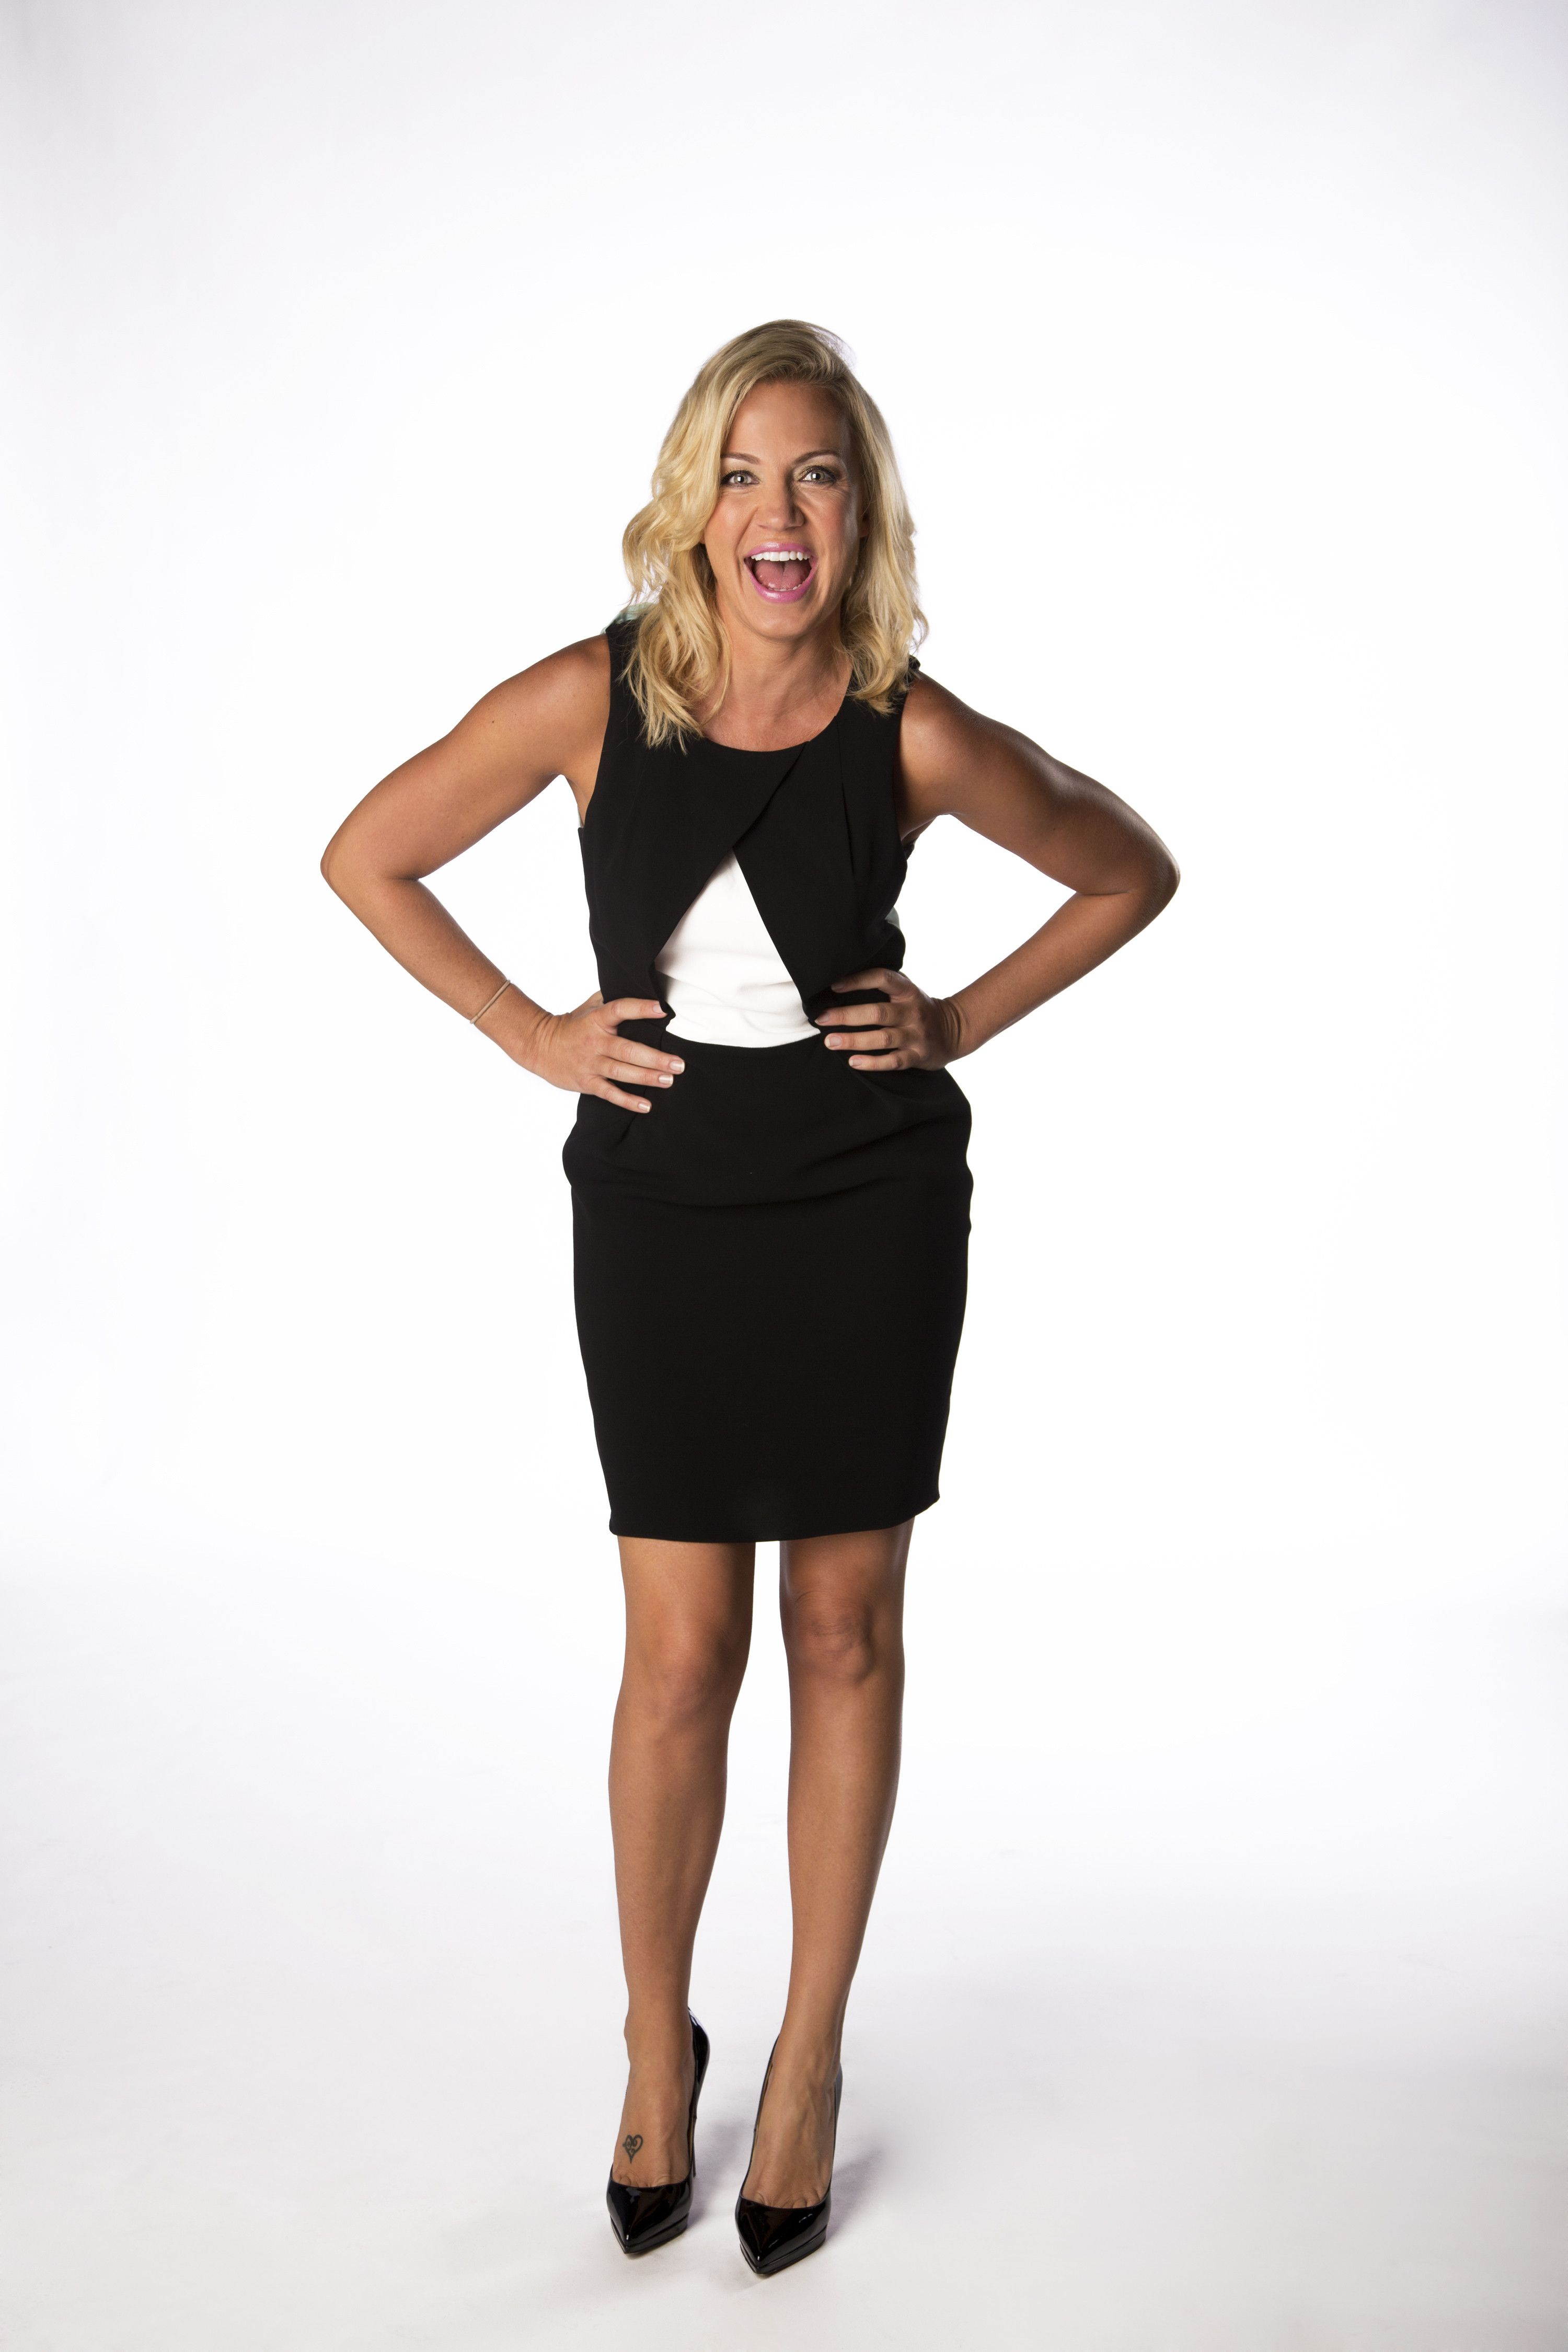 Michelle Beadle Heels How ESPN Host M...